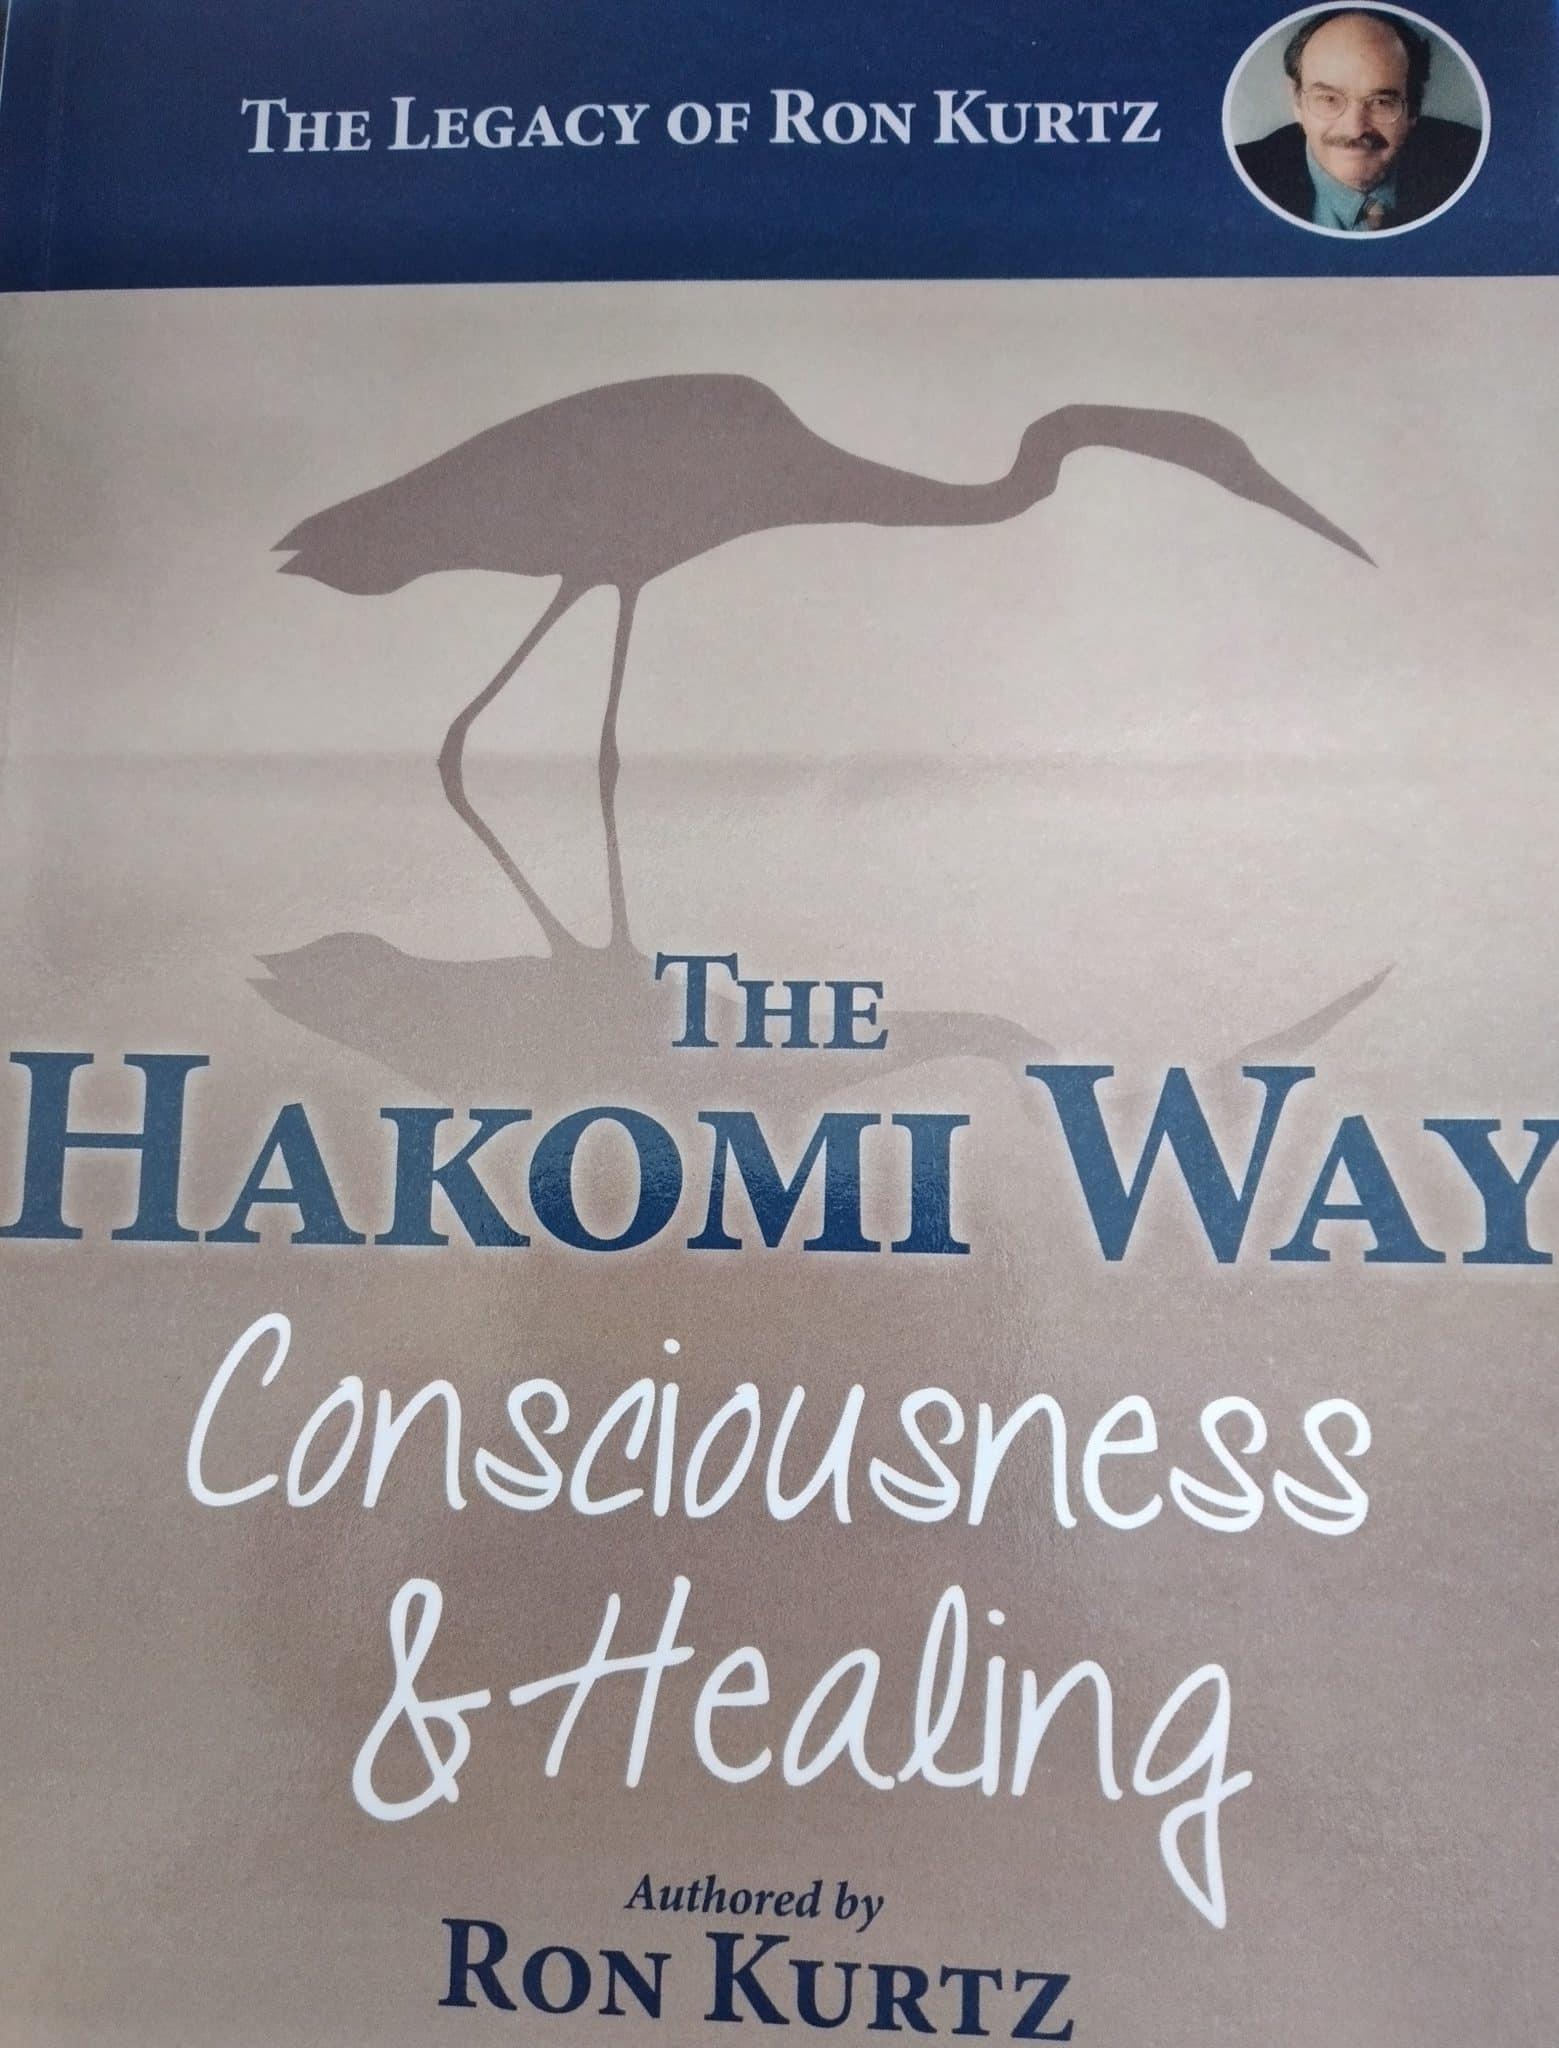 The Hakomi Way. Cosciousness & Healing